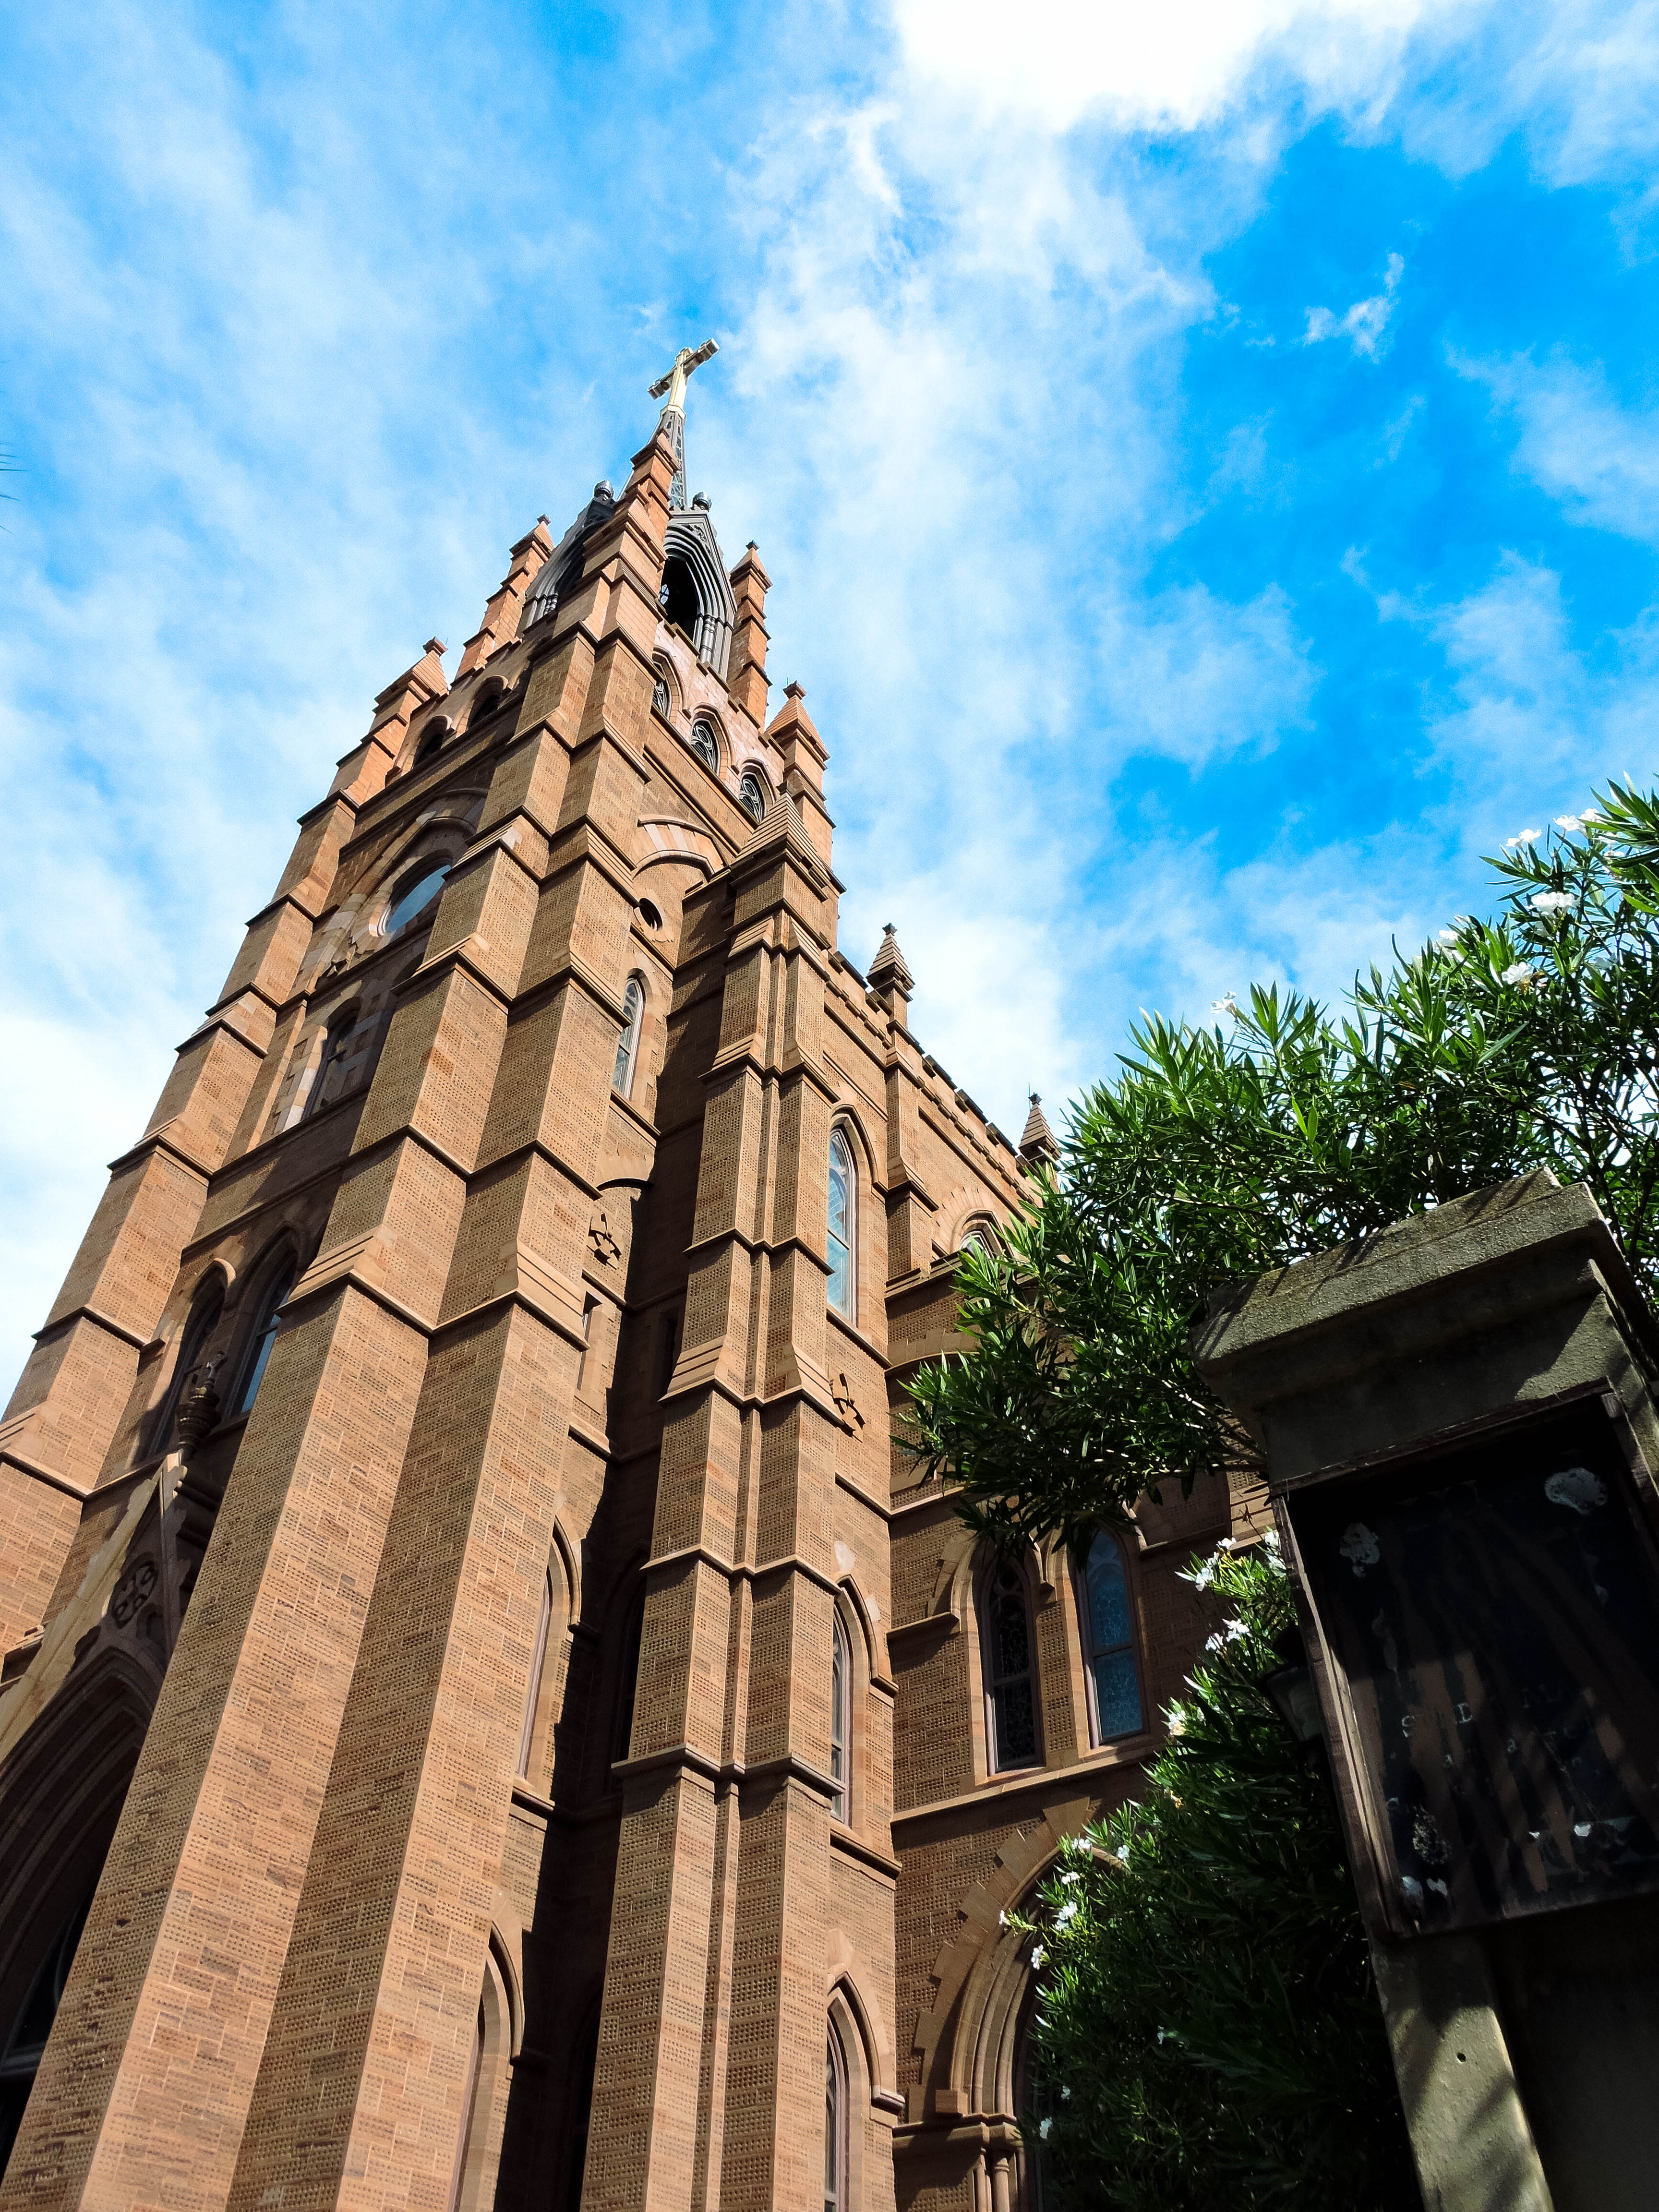 Cathedral of St. John the Baptist Charleston South Carolina